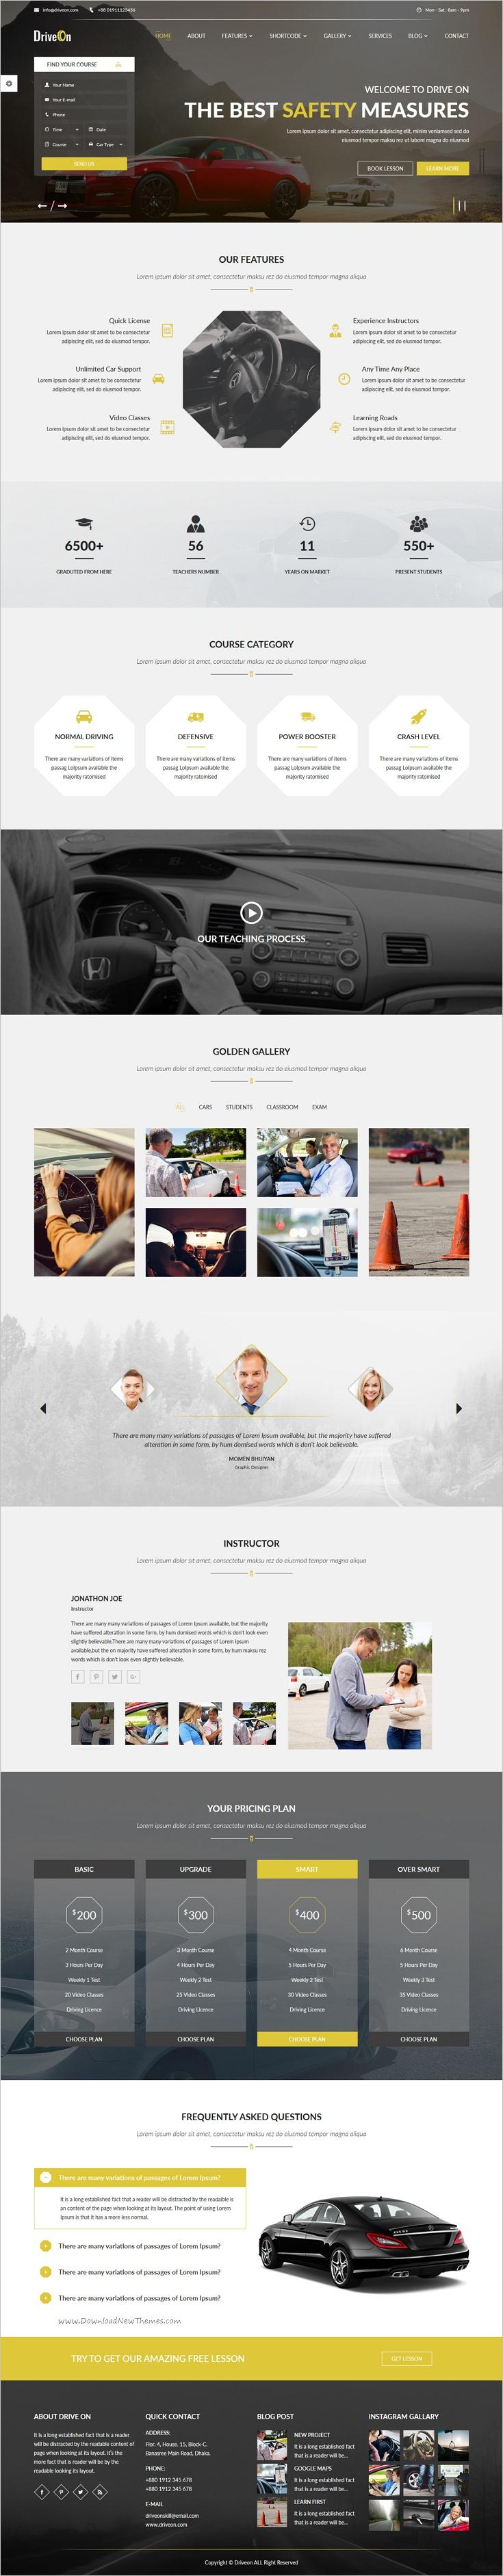 DriveOn – Driving School HTML Template | Driving school, School ...